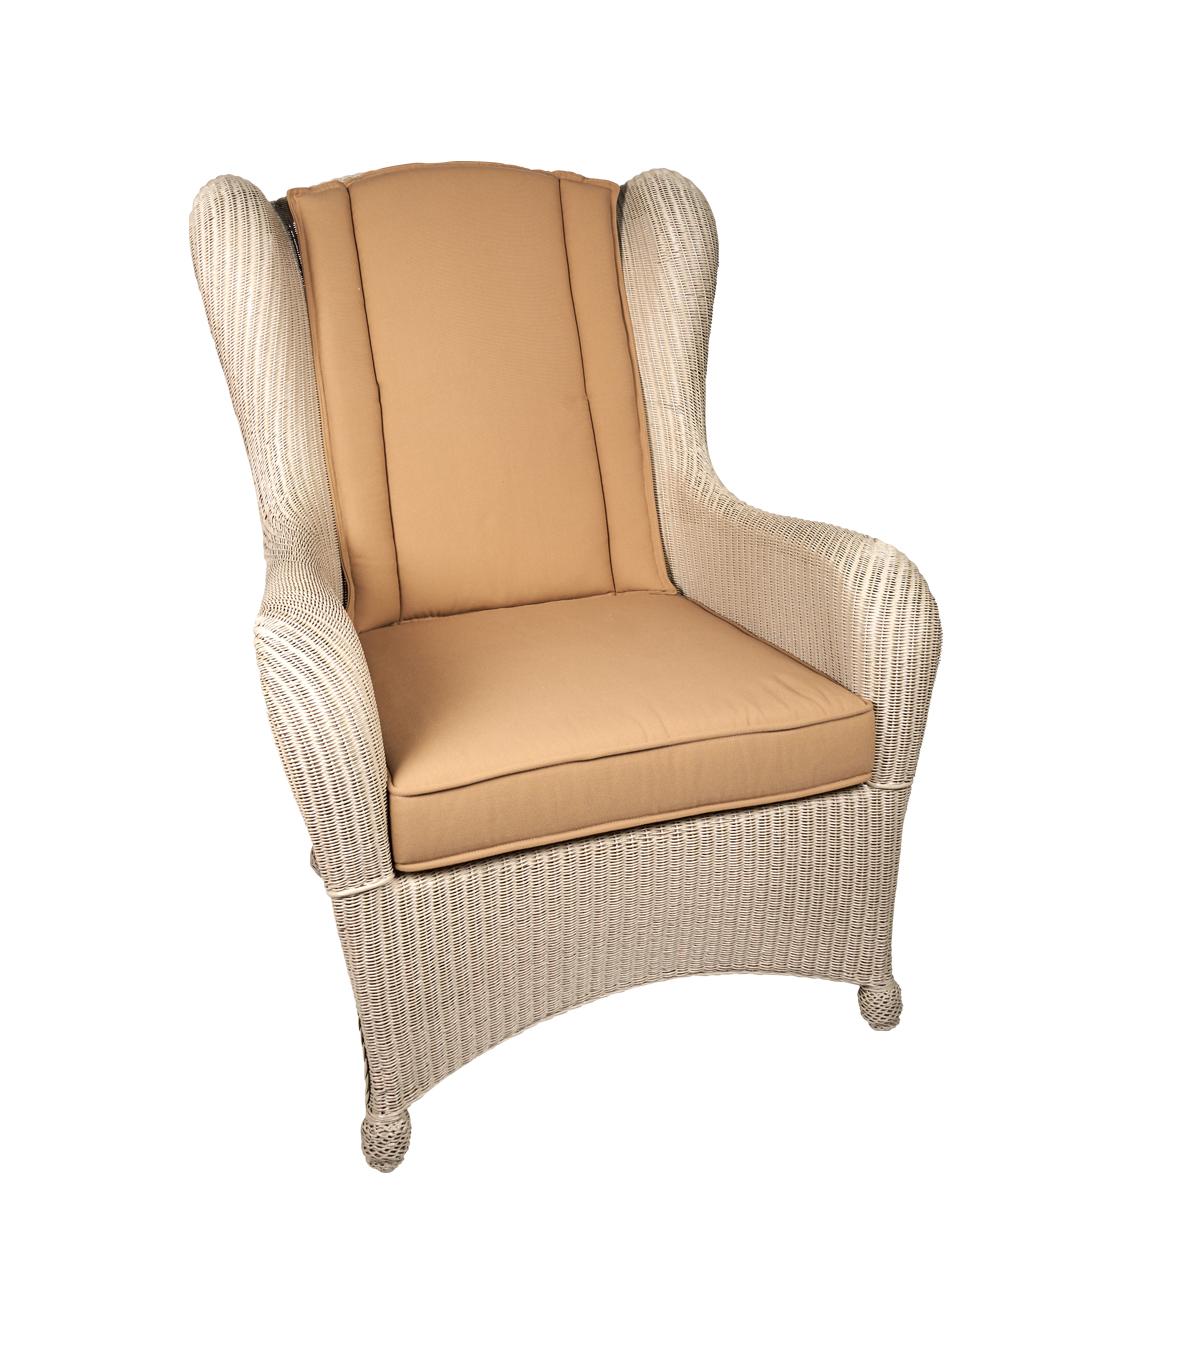 Lloyd loom fauteuil Hull Parel Wit